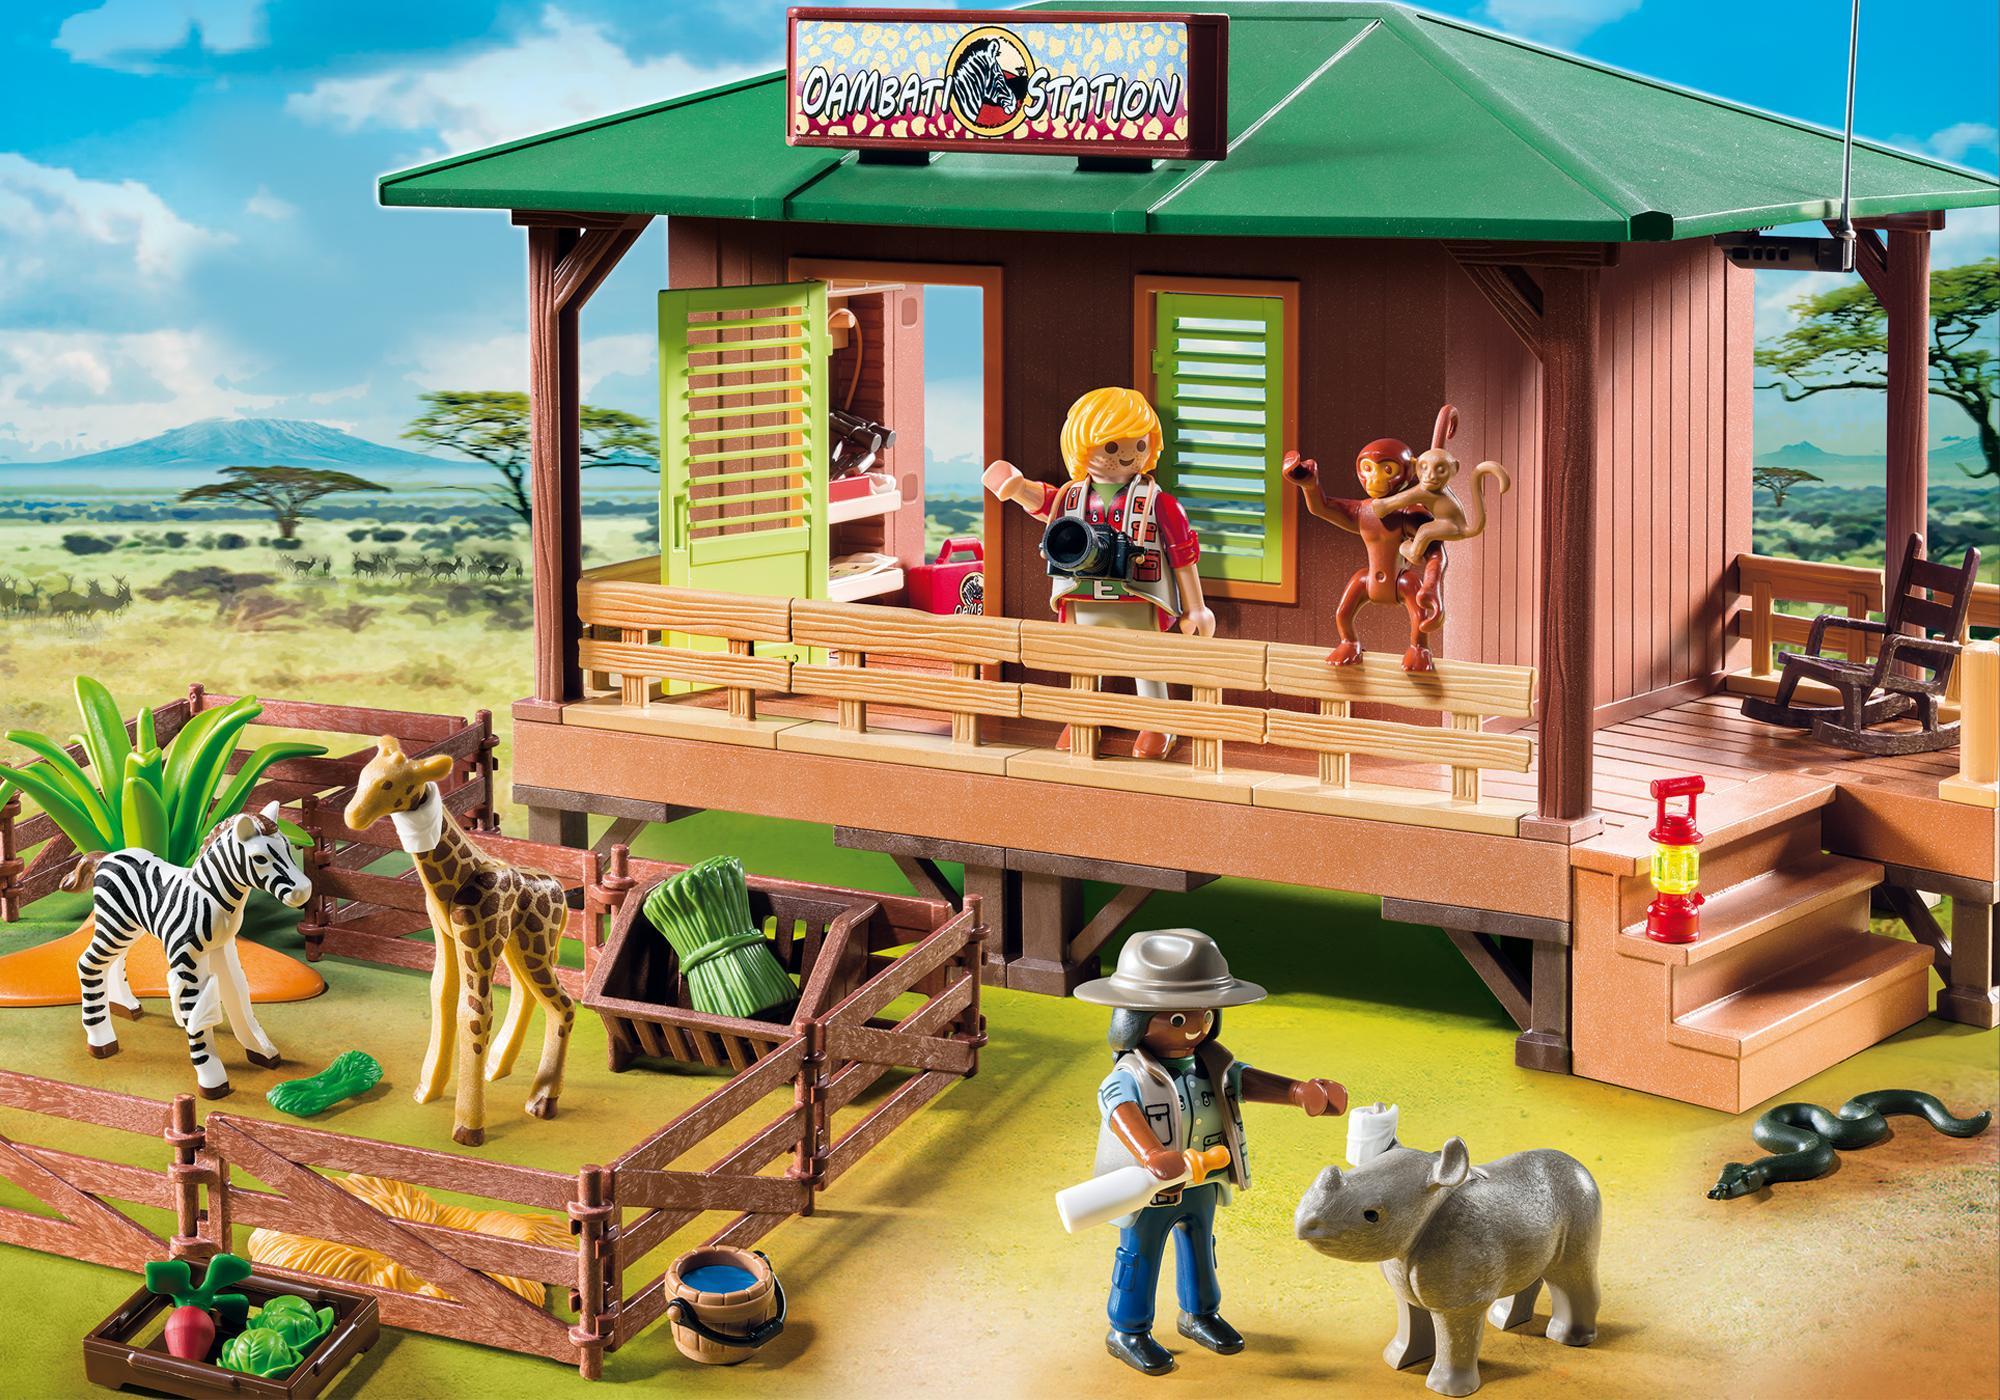 http://media.playmobil.com/i/playmobil/6936_product_detail/Σταθμός περίθαλψης άγριων ζώων